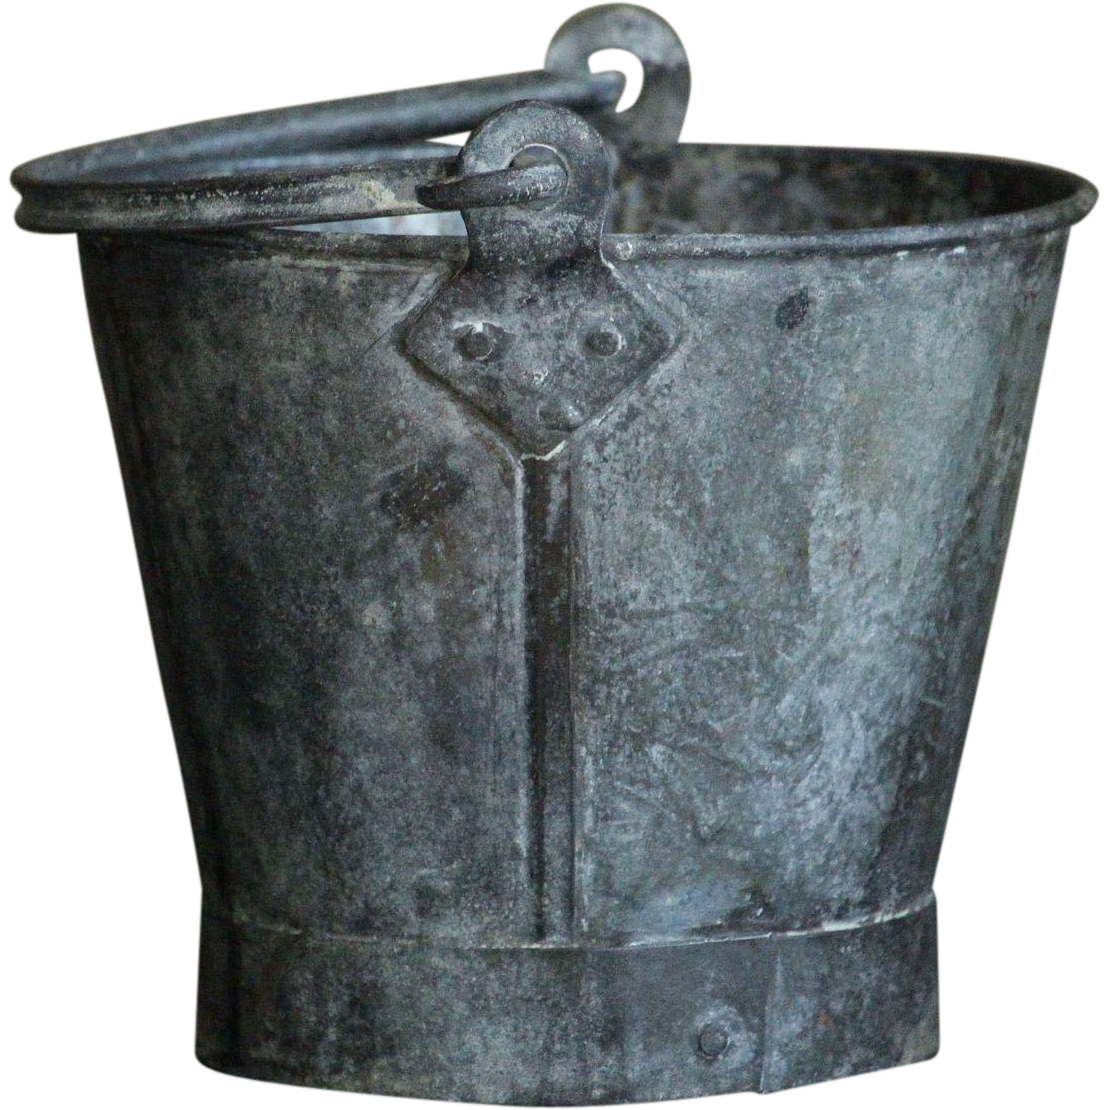 Antique Small Child Size English Galvanized Metal Pail